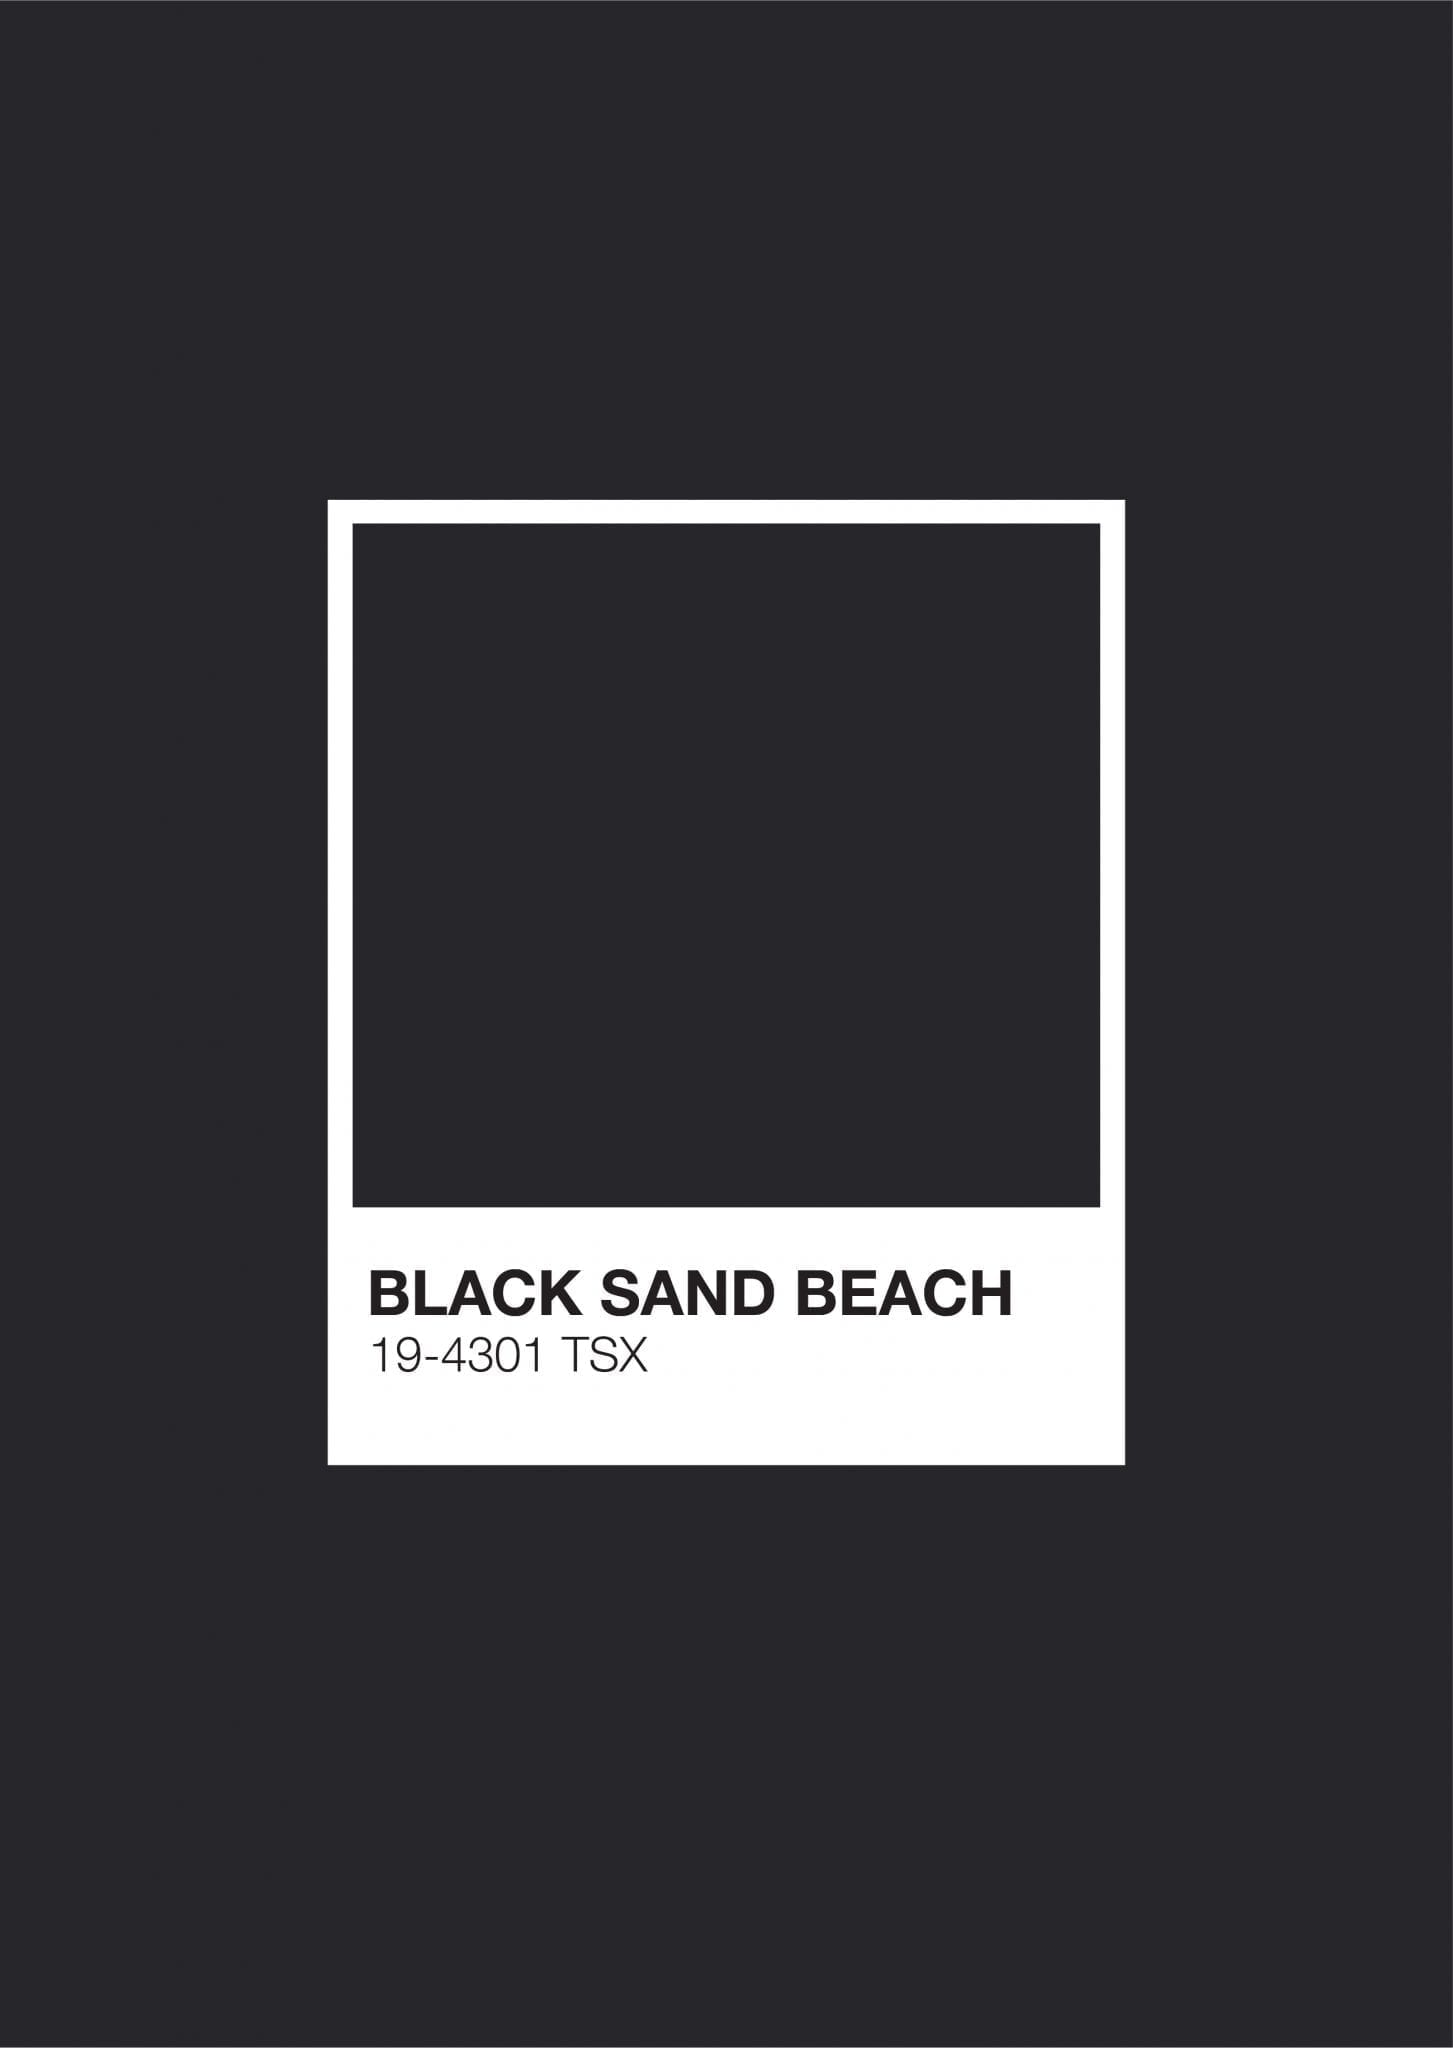 Iceland Pantone: Black Sand Beach